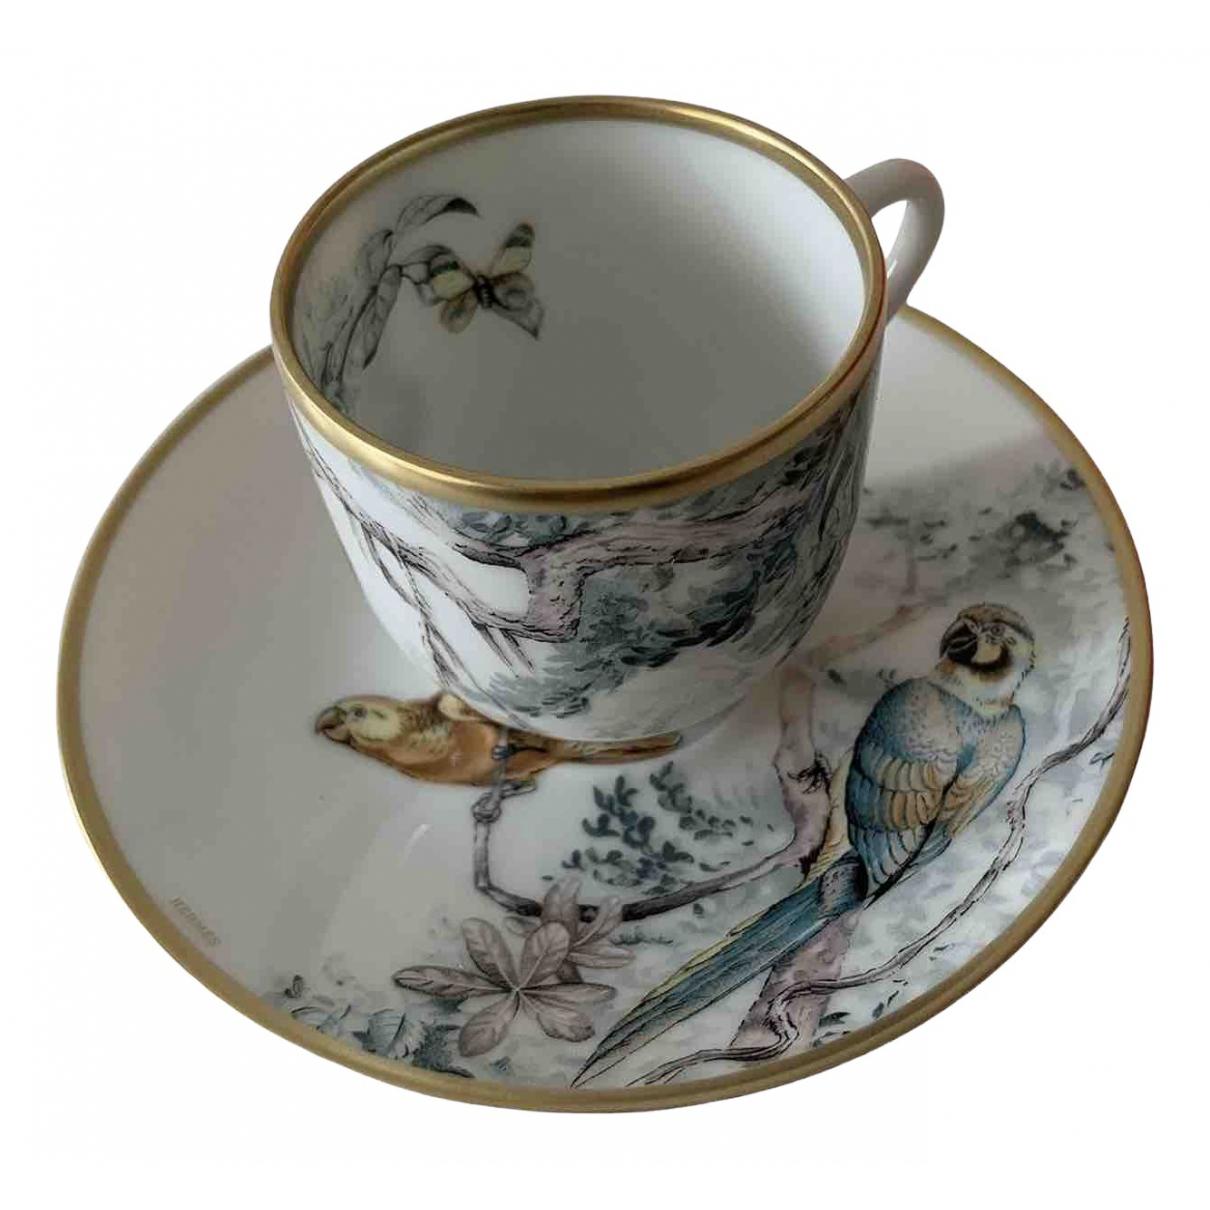 Hermes Carnets dEquateur Tischkultur in  Weiss Porzellan